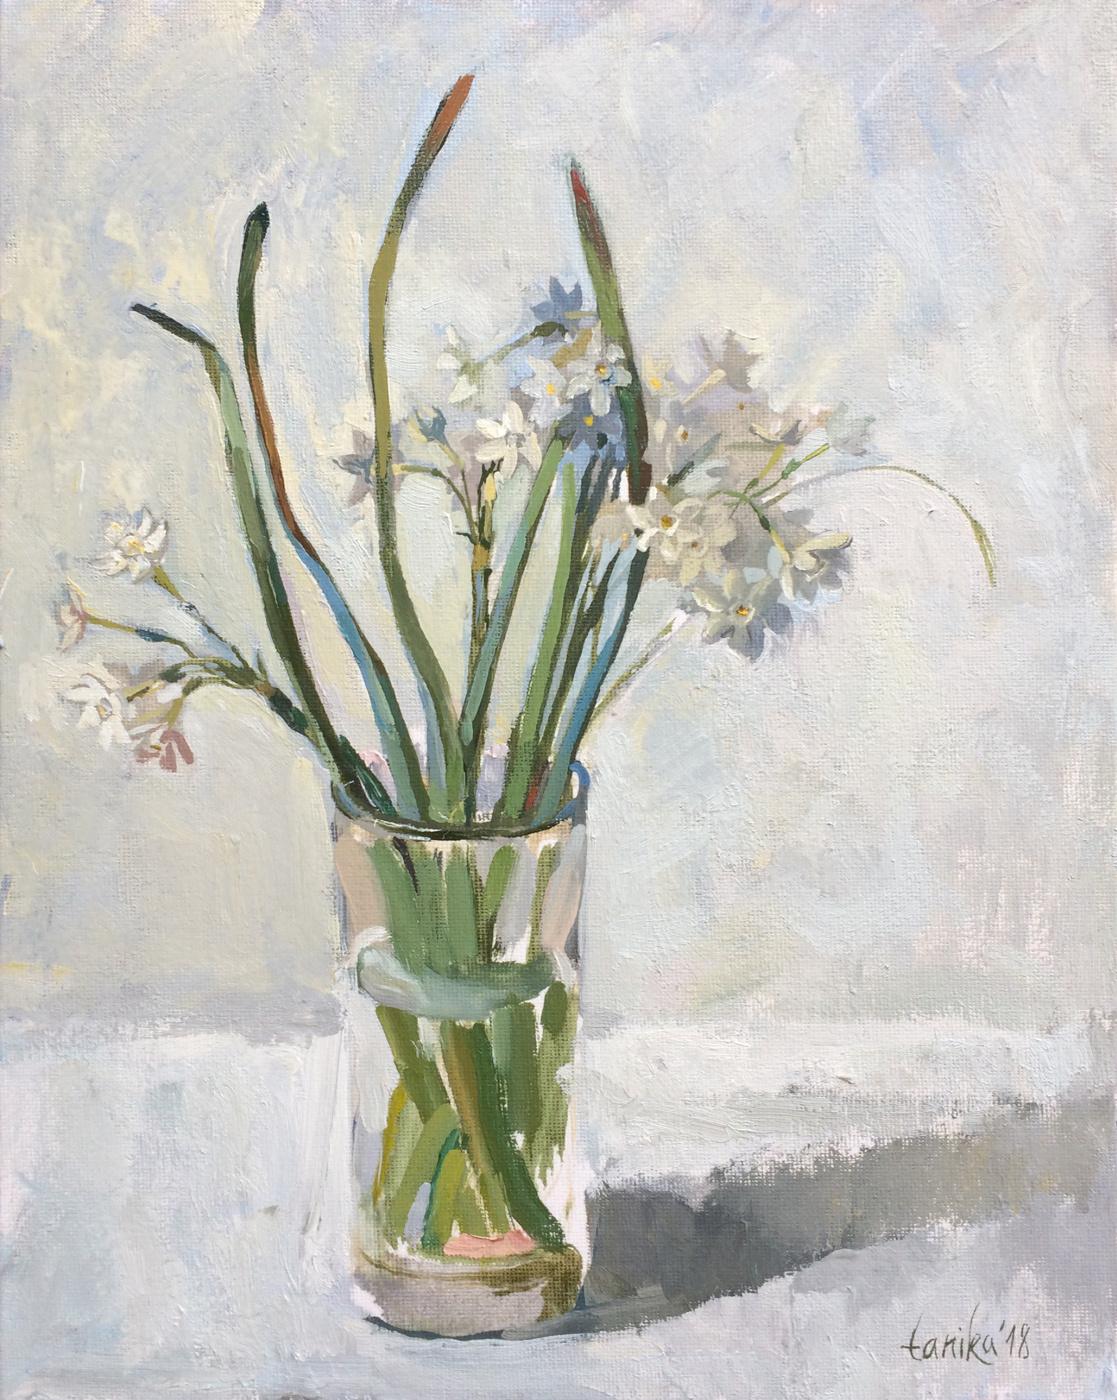 Tanika Yezhova. Daffodils